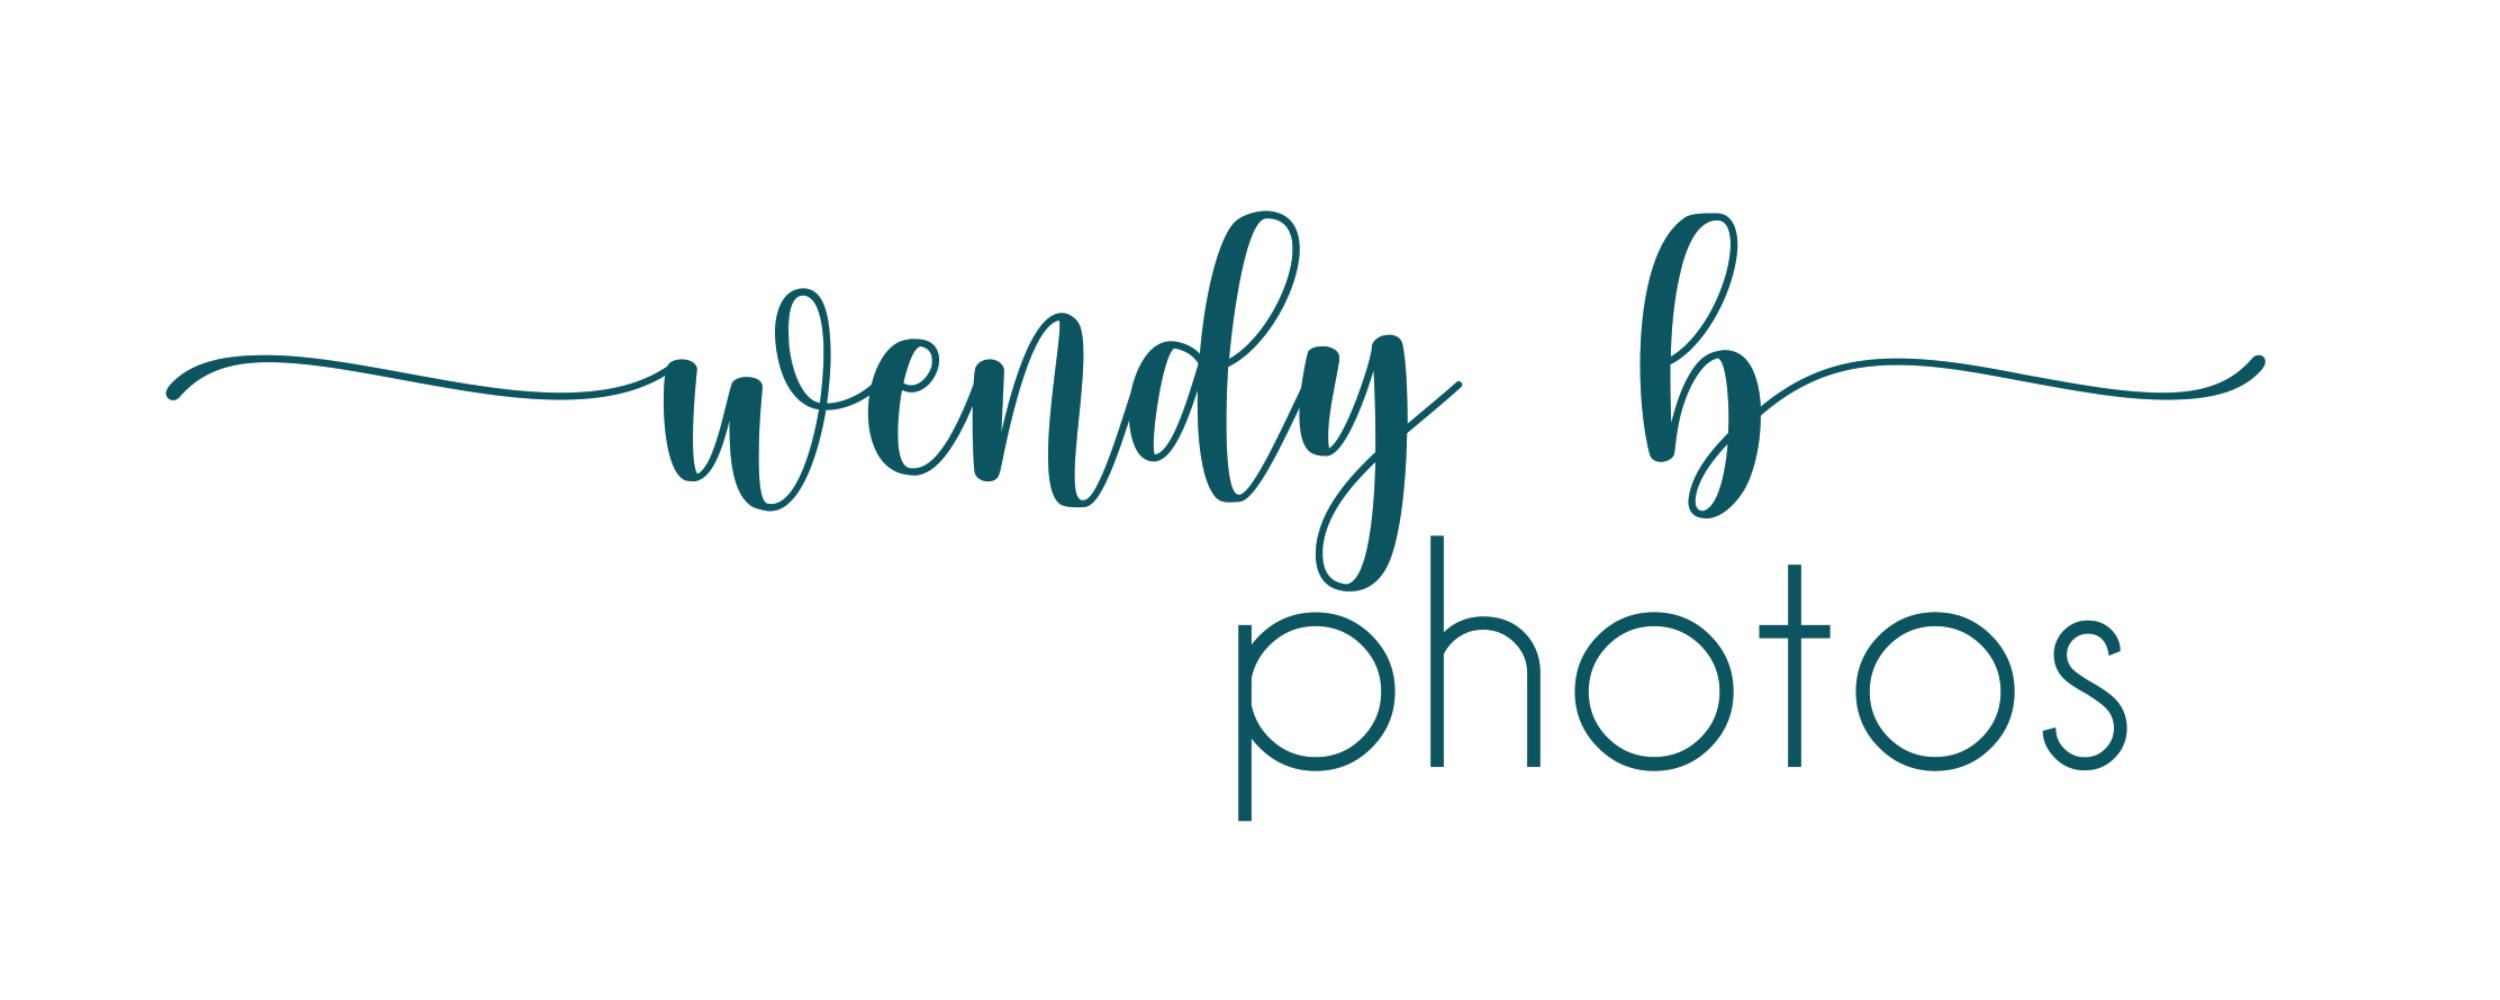 wendy b photos logo